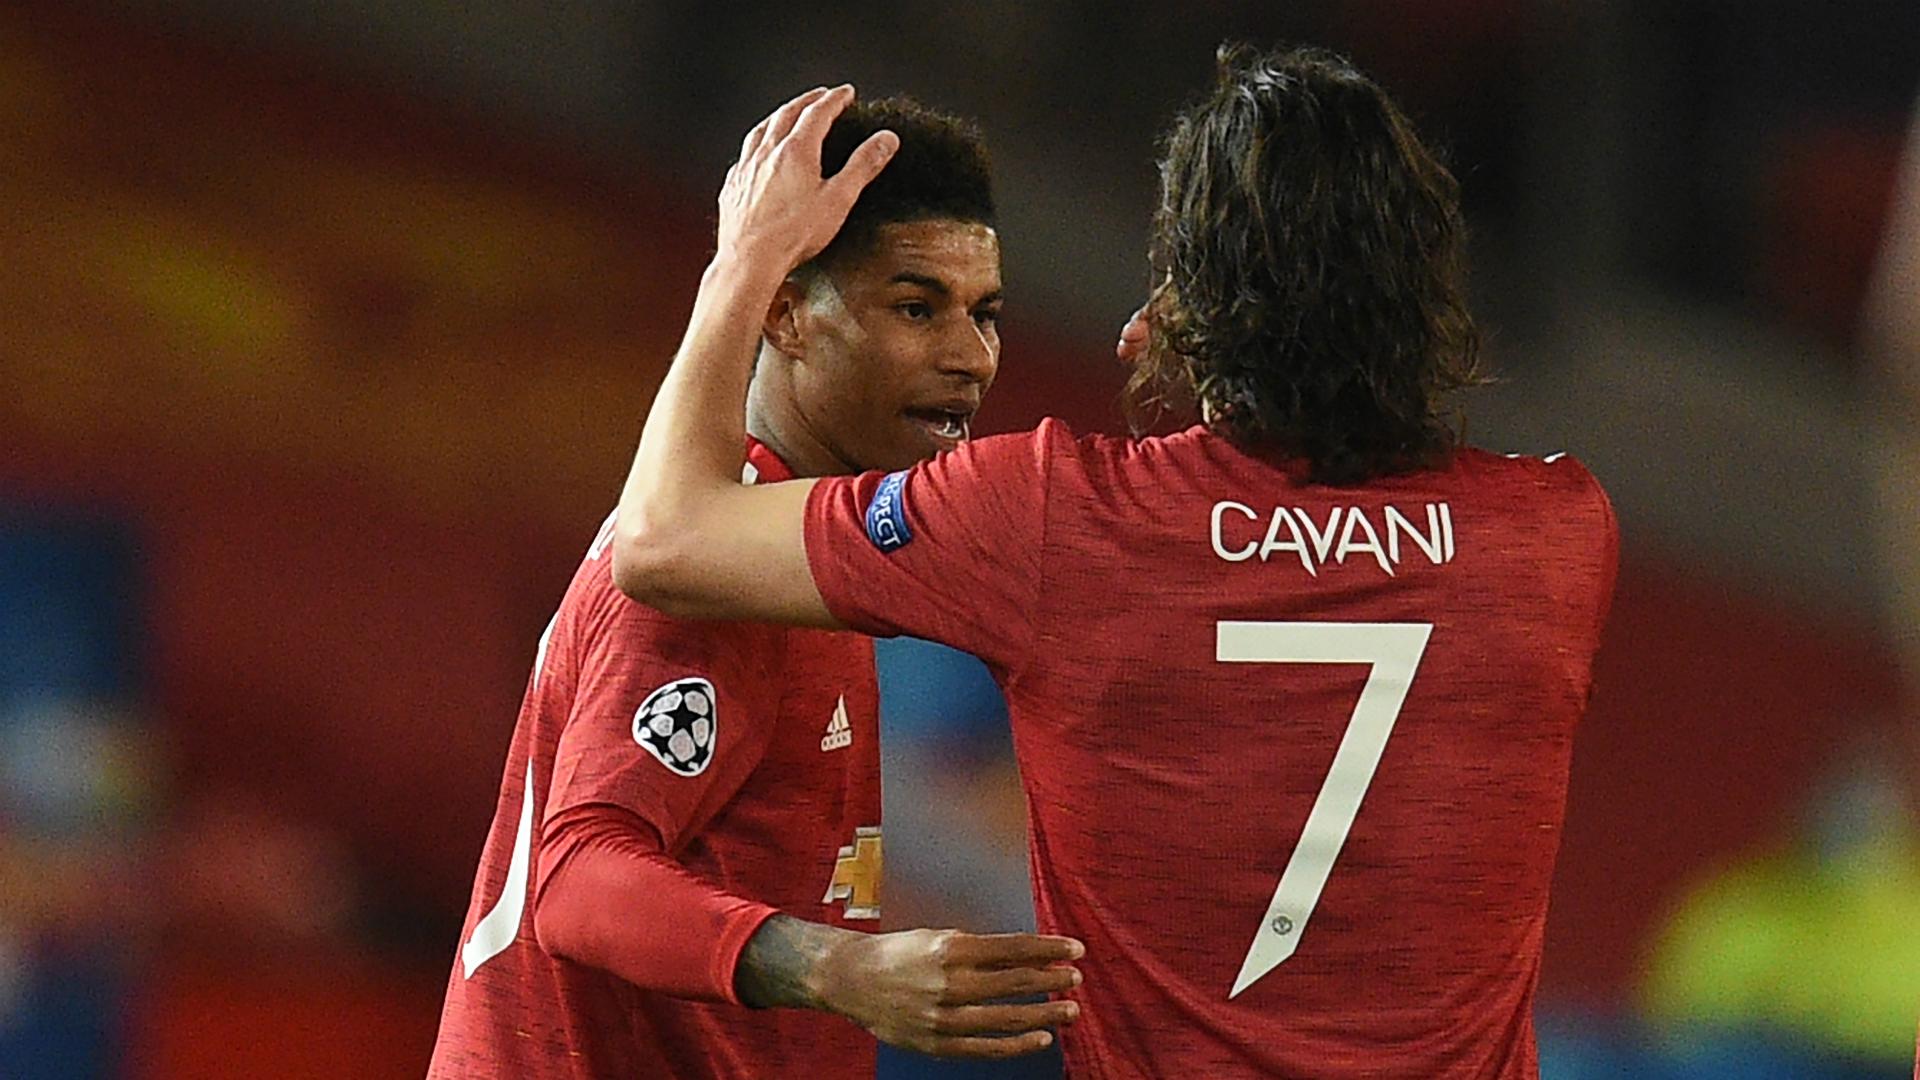 Cavani gives Man Utd another dimension, says Rashford